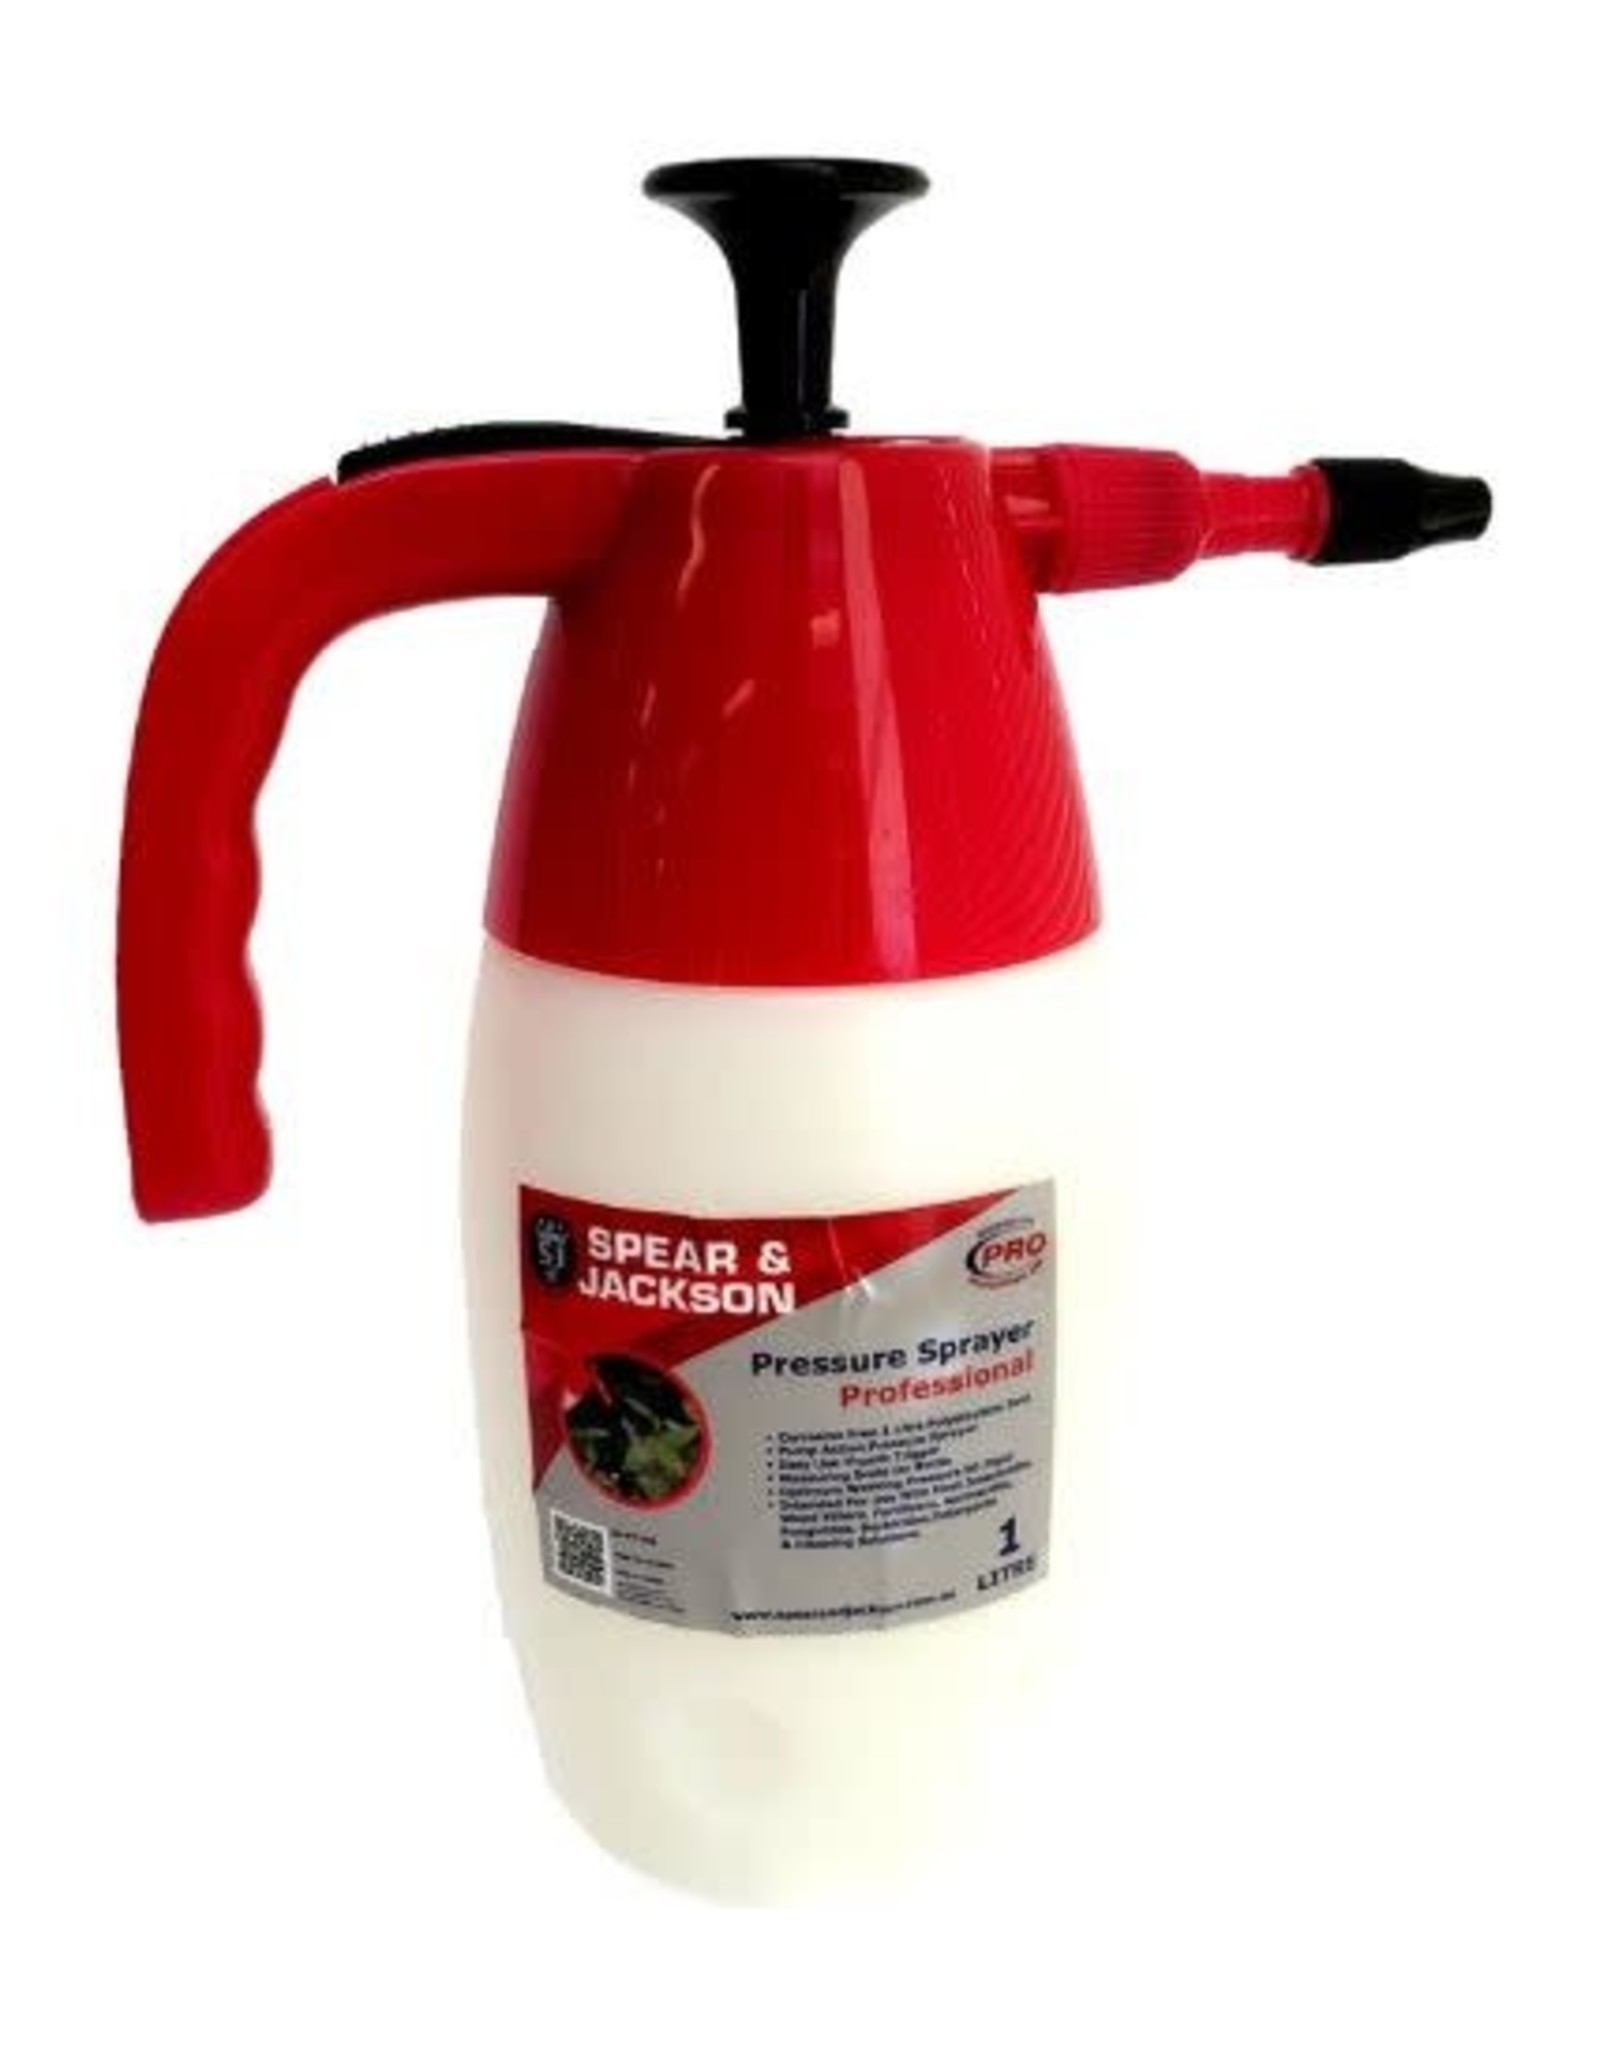 Spear & Jackson Pressure Sprayer 1 ltr